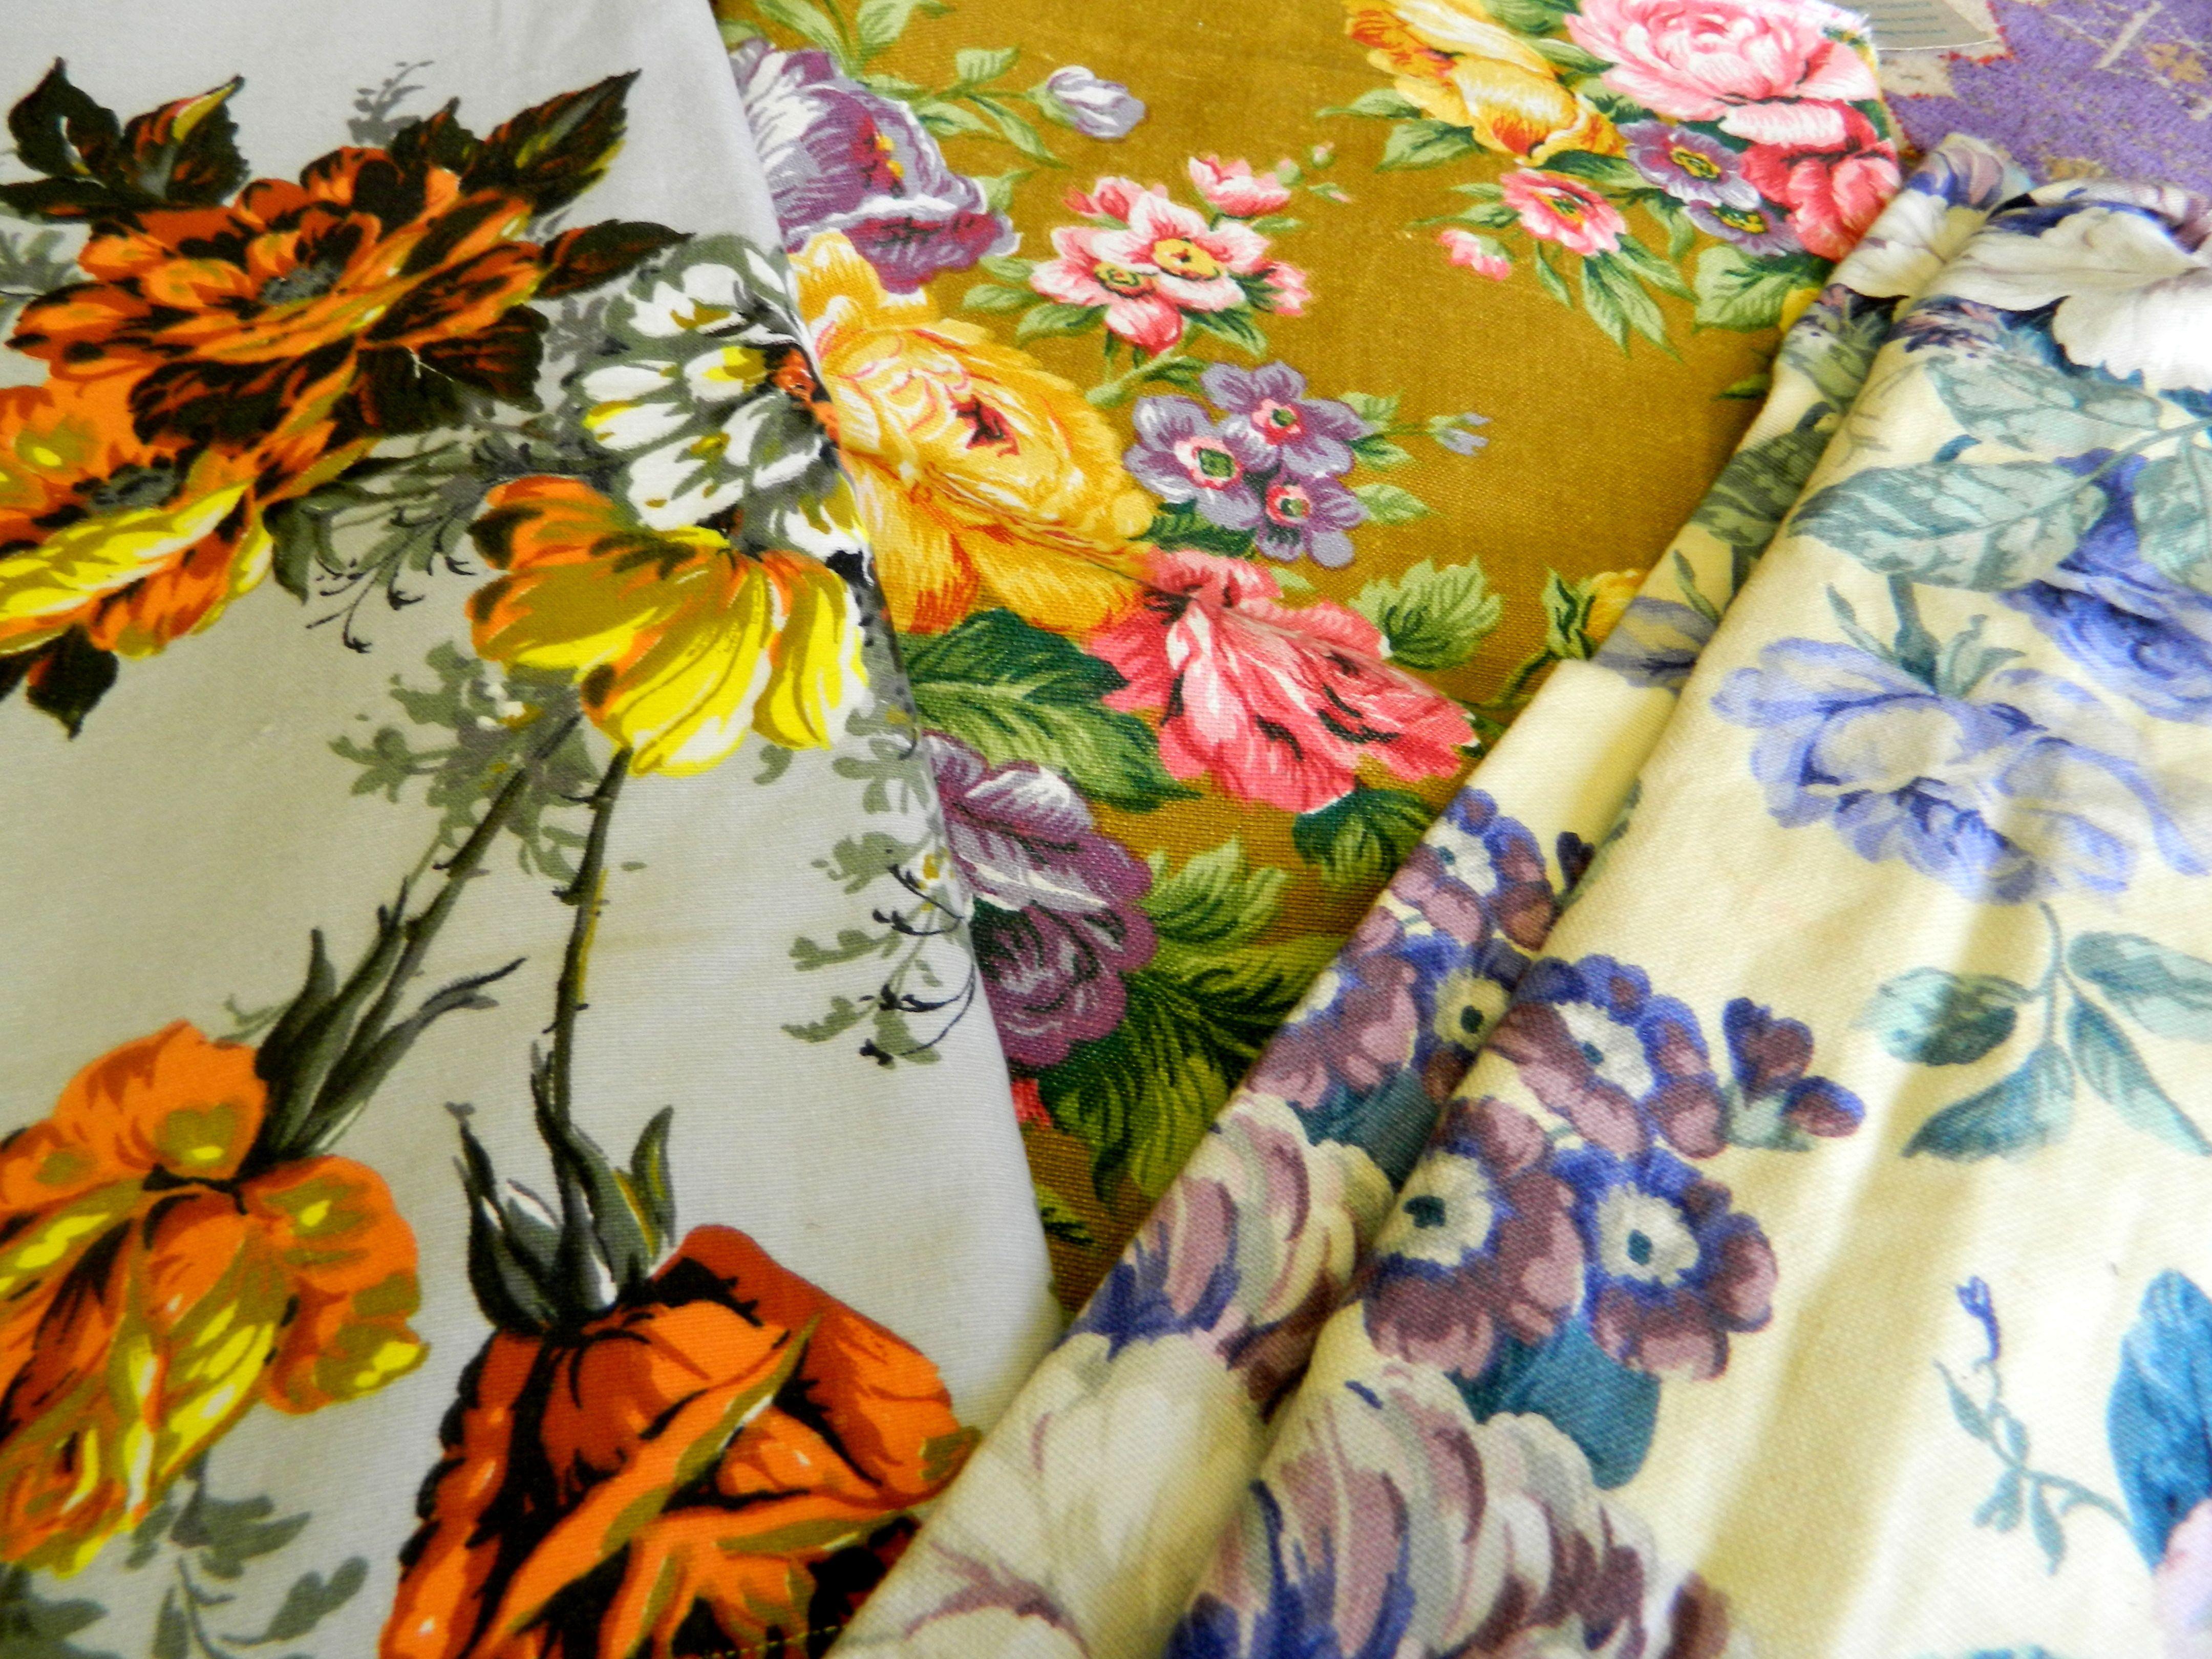 Ambiance Et Patines Valence pin on enchanting floralvelvet eccentric